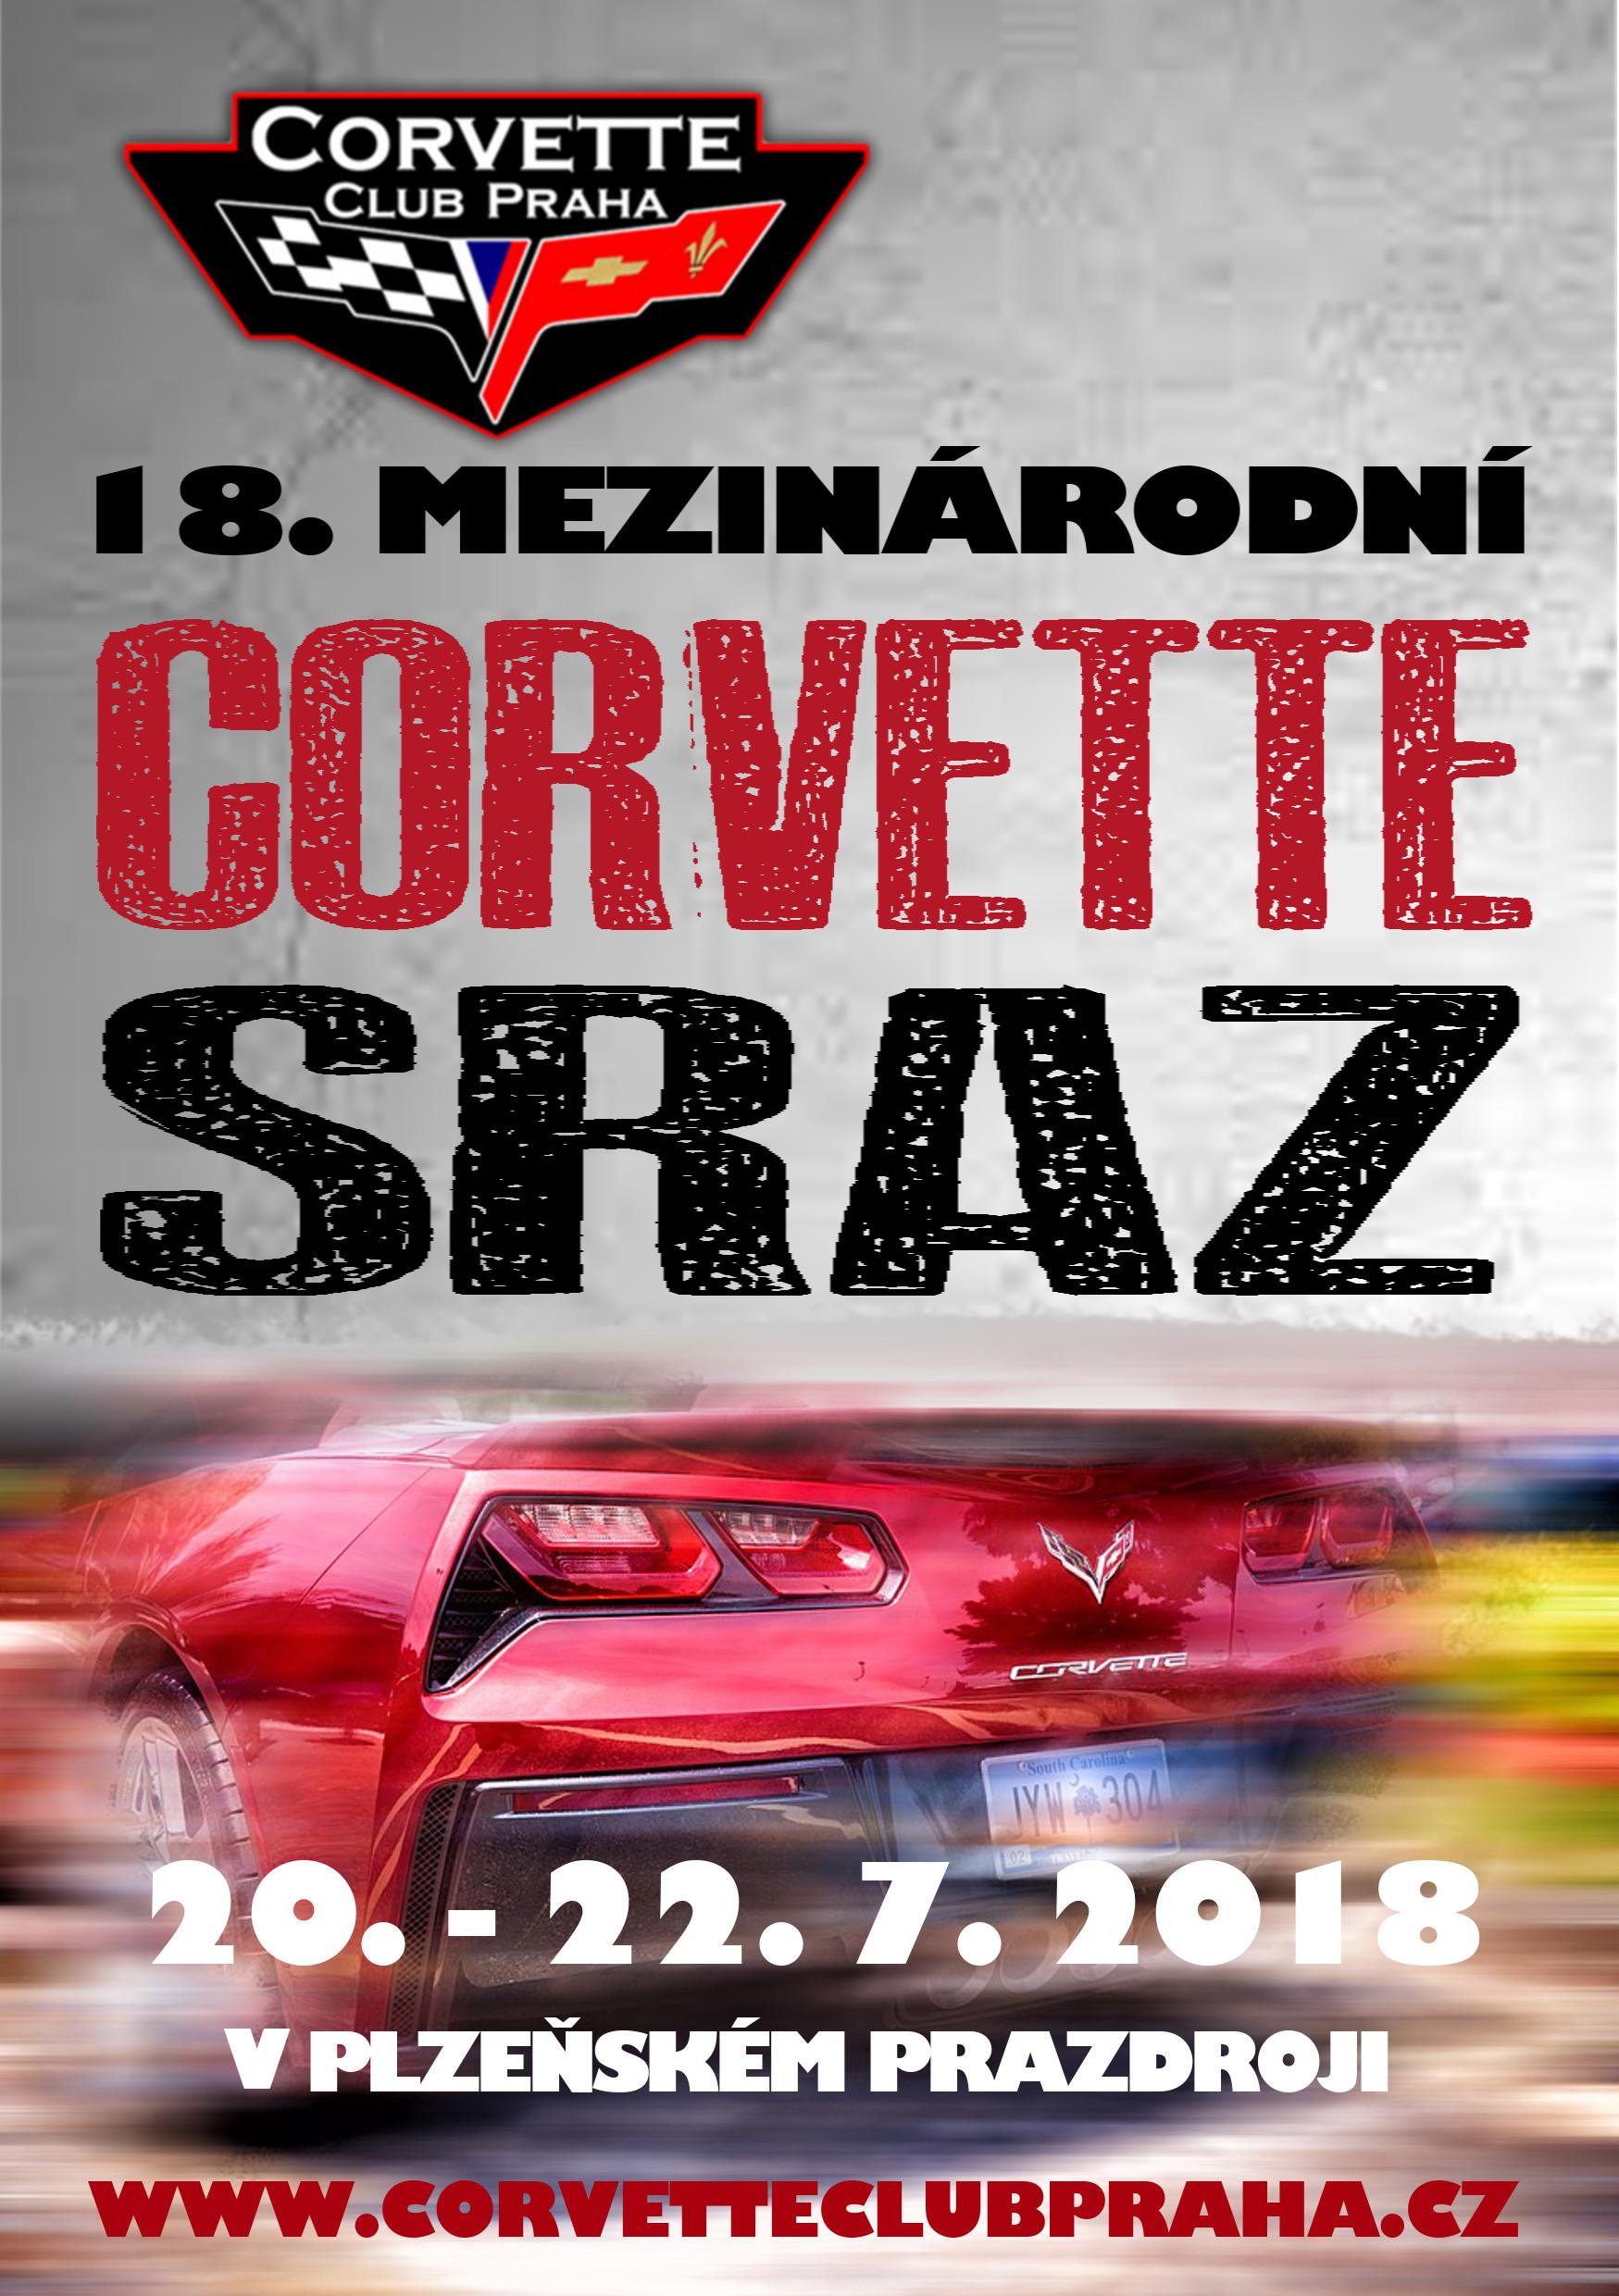 18. Mezinárodní sraz Corvette Club Praha